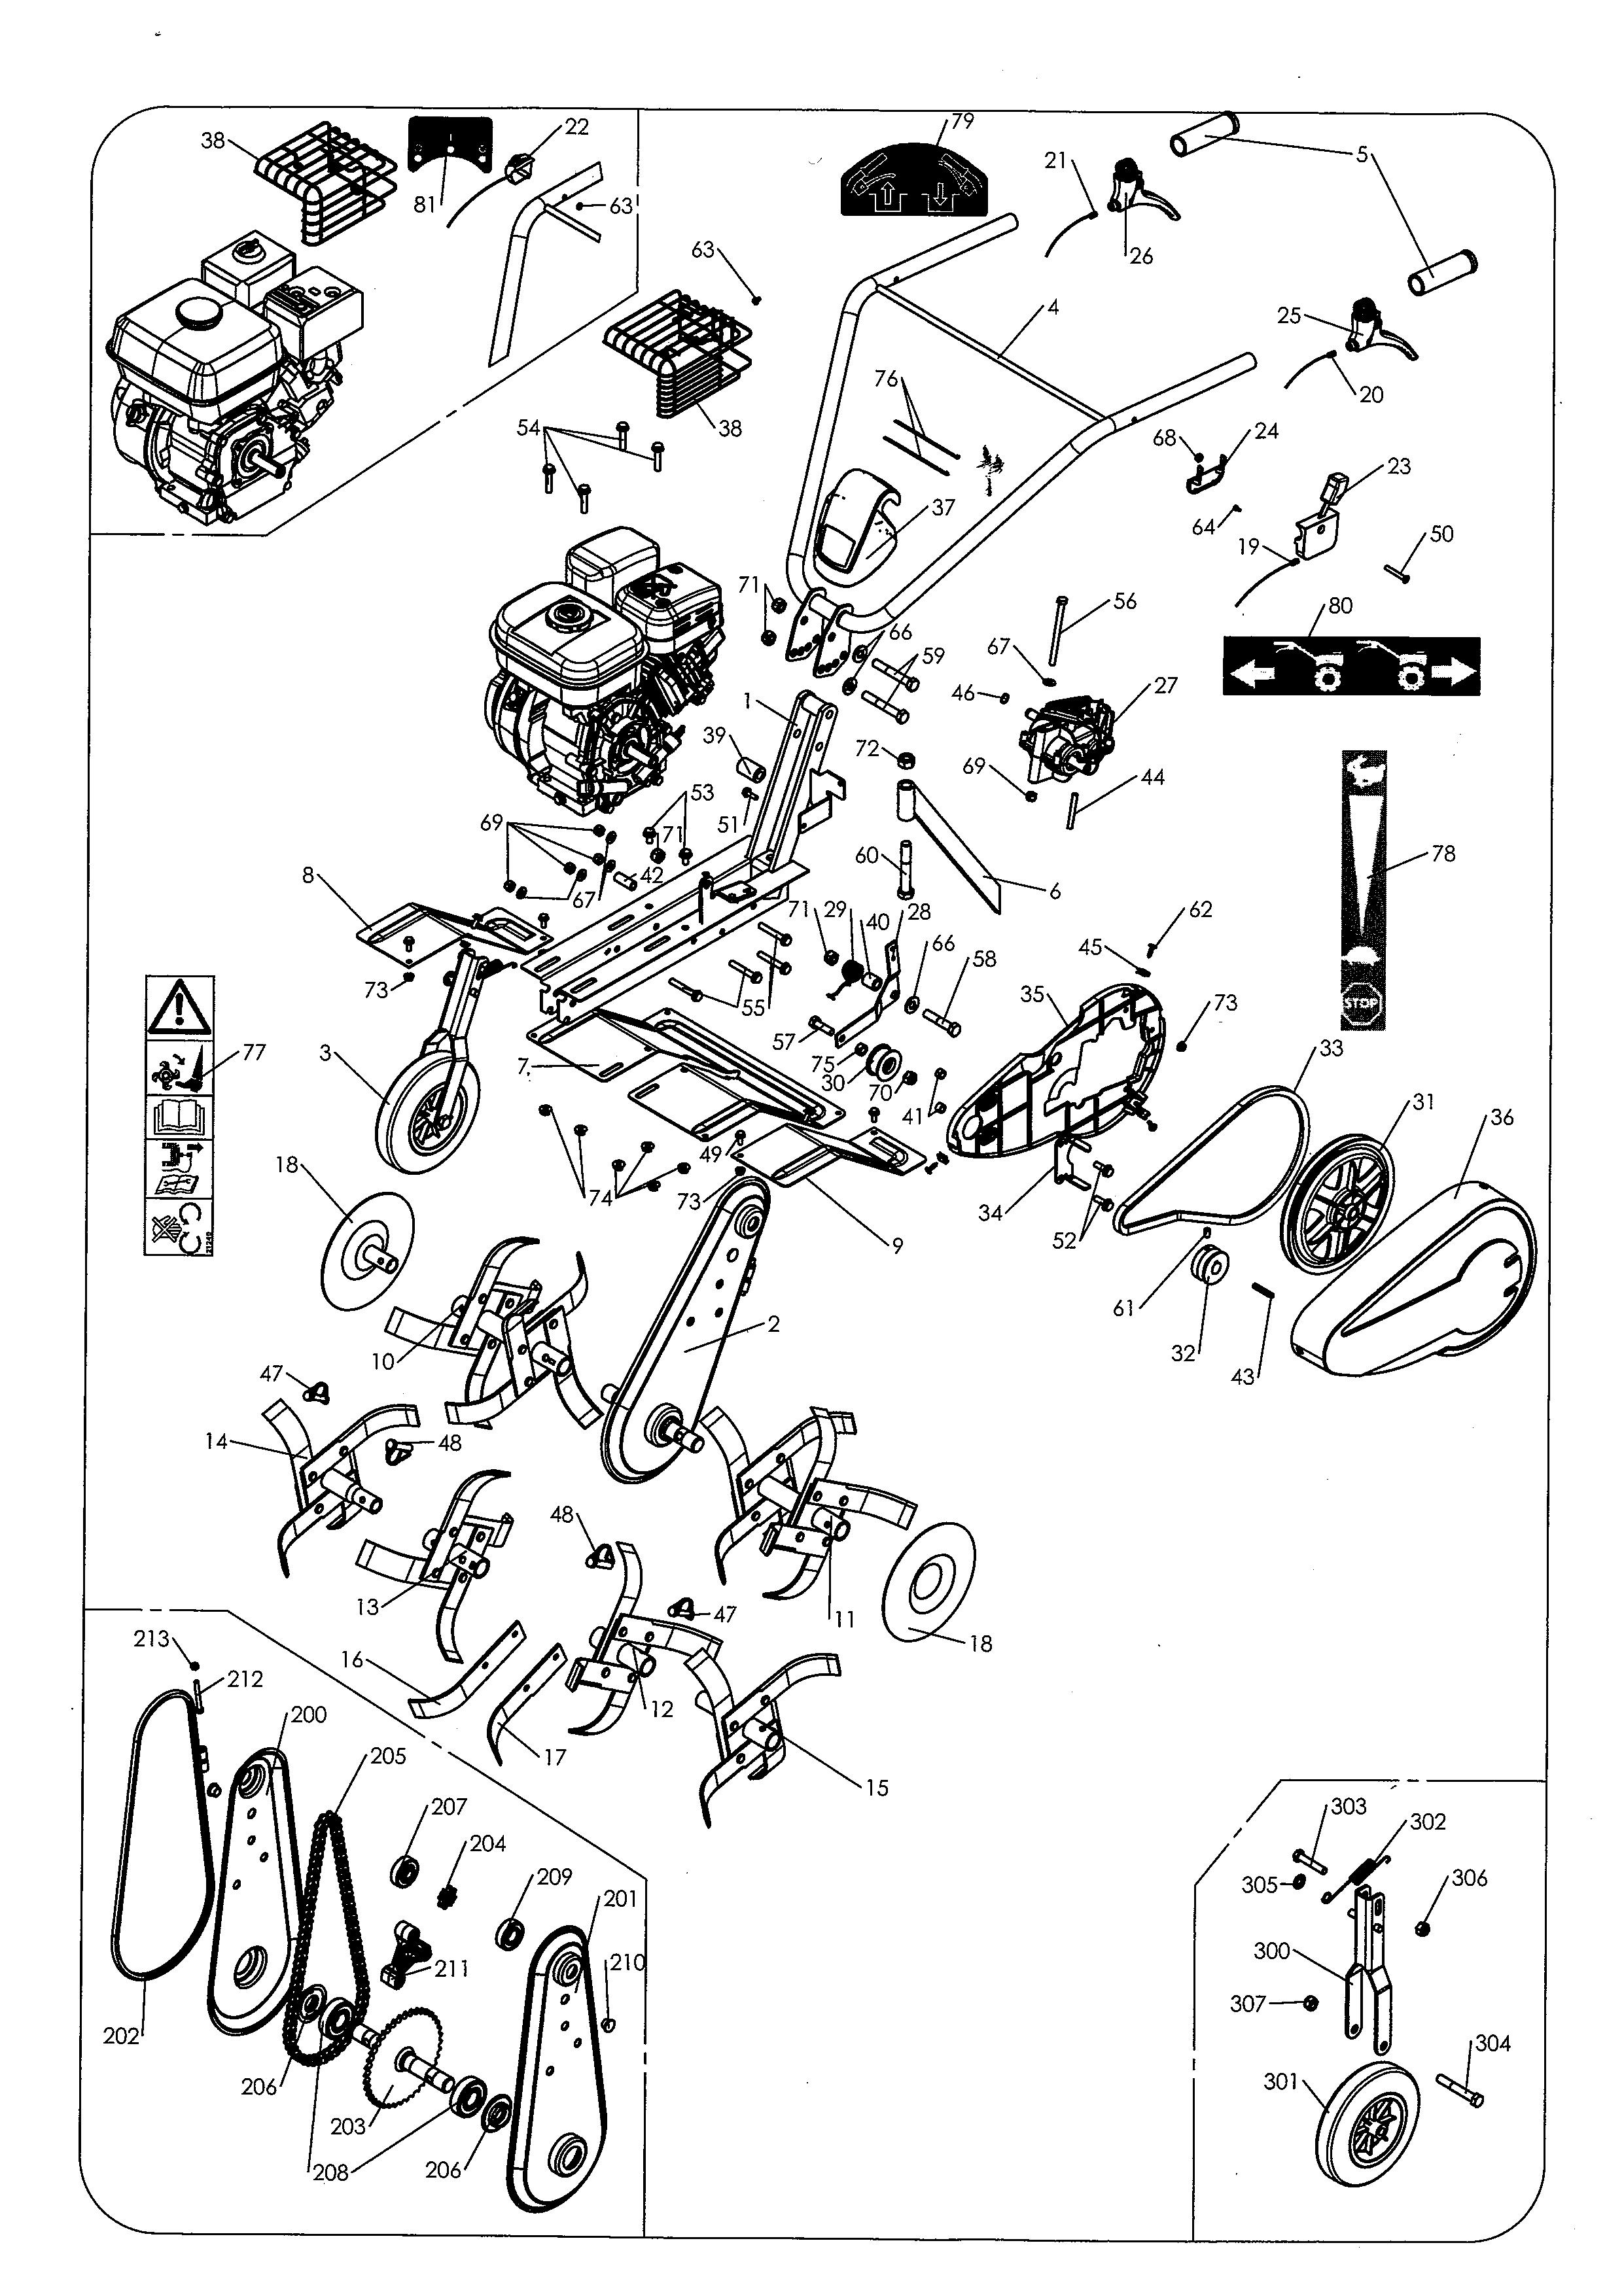 MH 4 Pro Evo Motobineuse OLEOMAC  Dessins pièces -  Vue éclatée